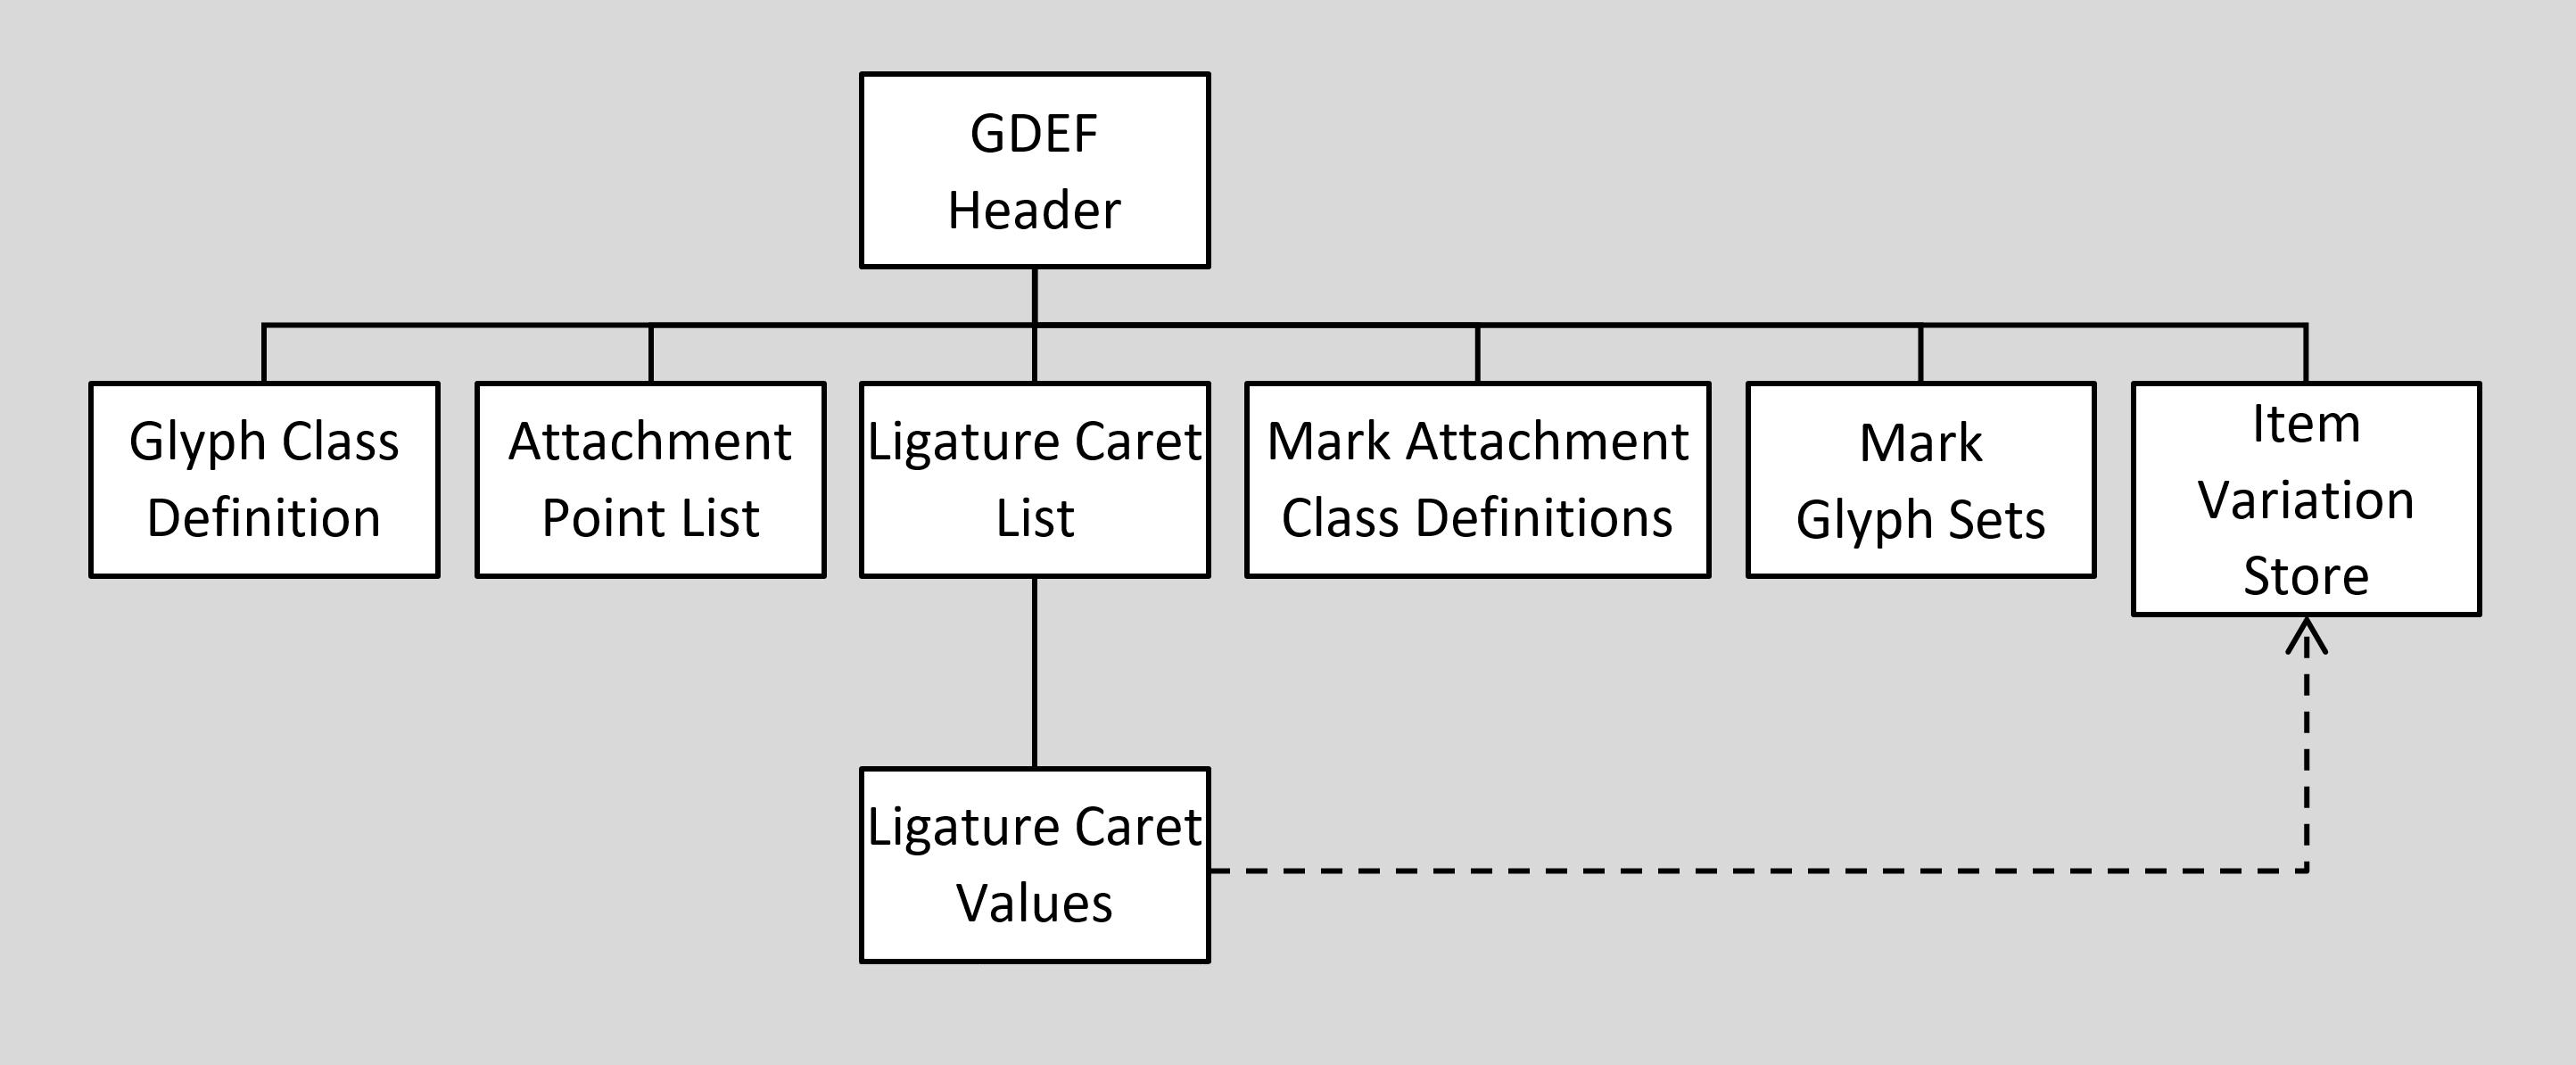 Gdef Glyph Definition Table Typography Microsoft Docs